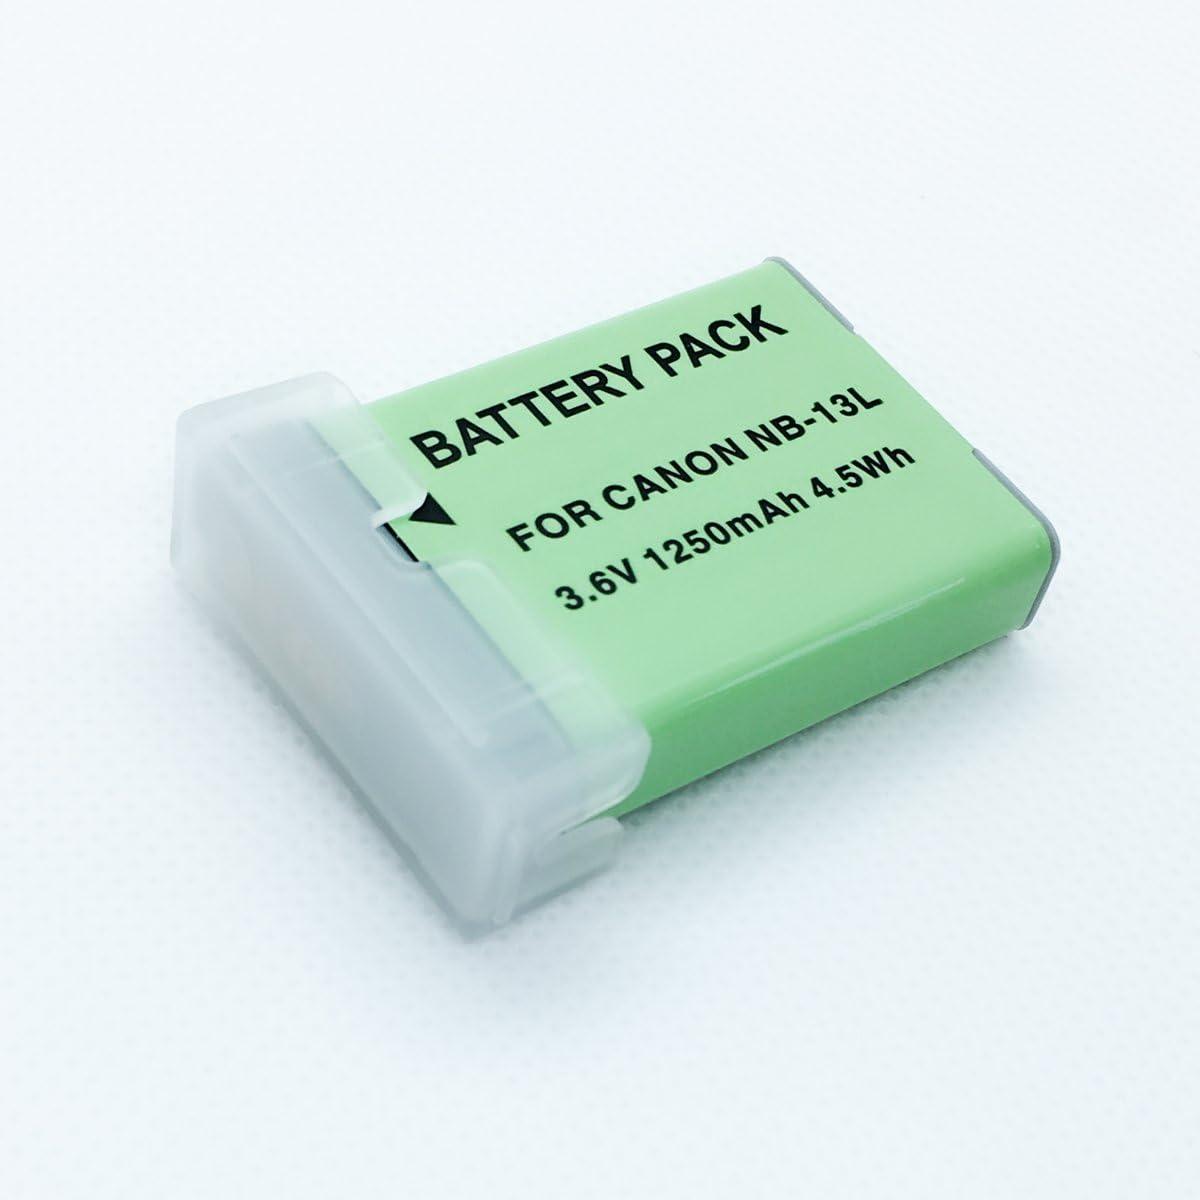 Batteries 2 unisex Pack for Canon PowerShot Sale price G7 Mark G X G5 II